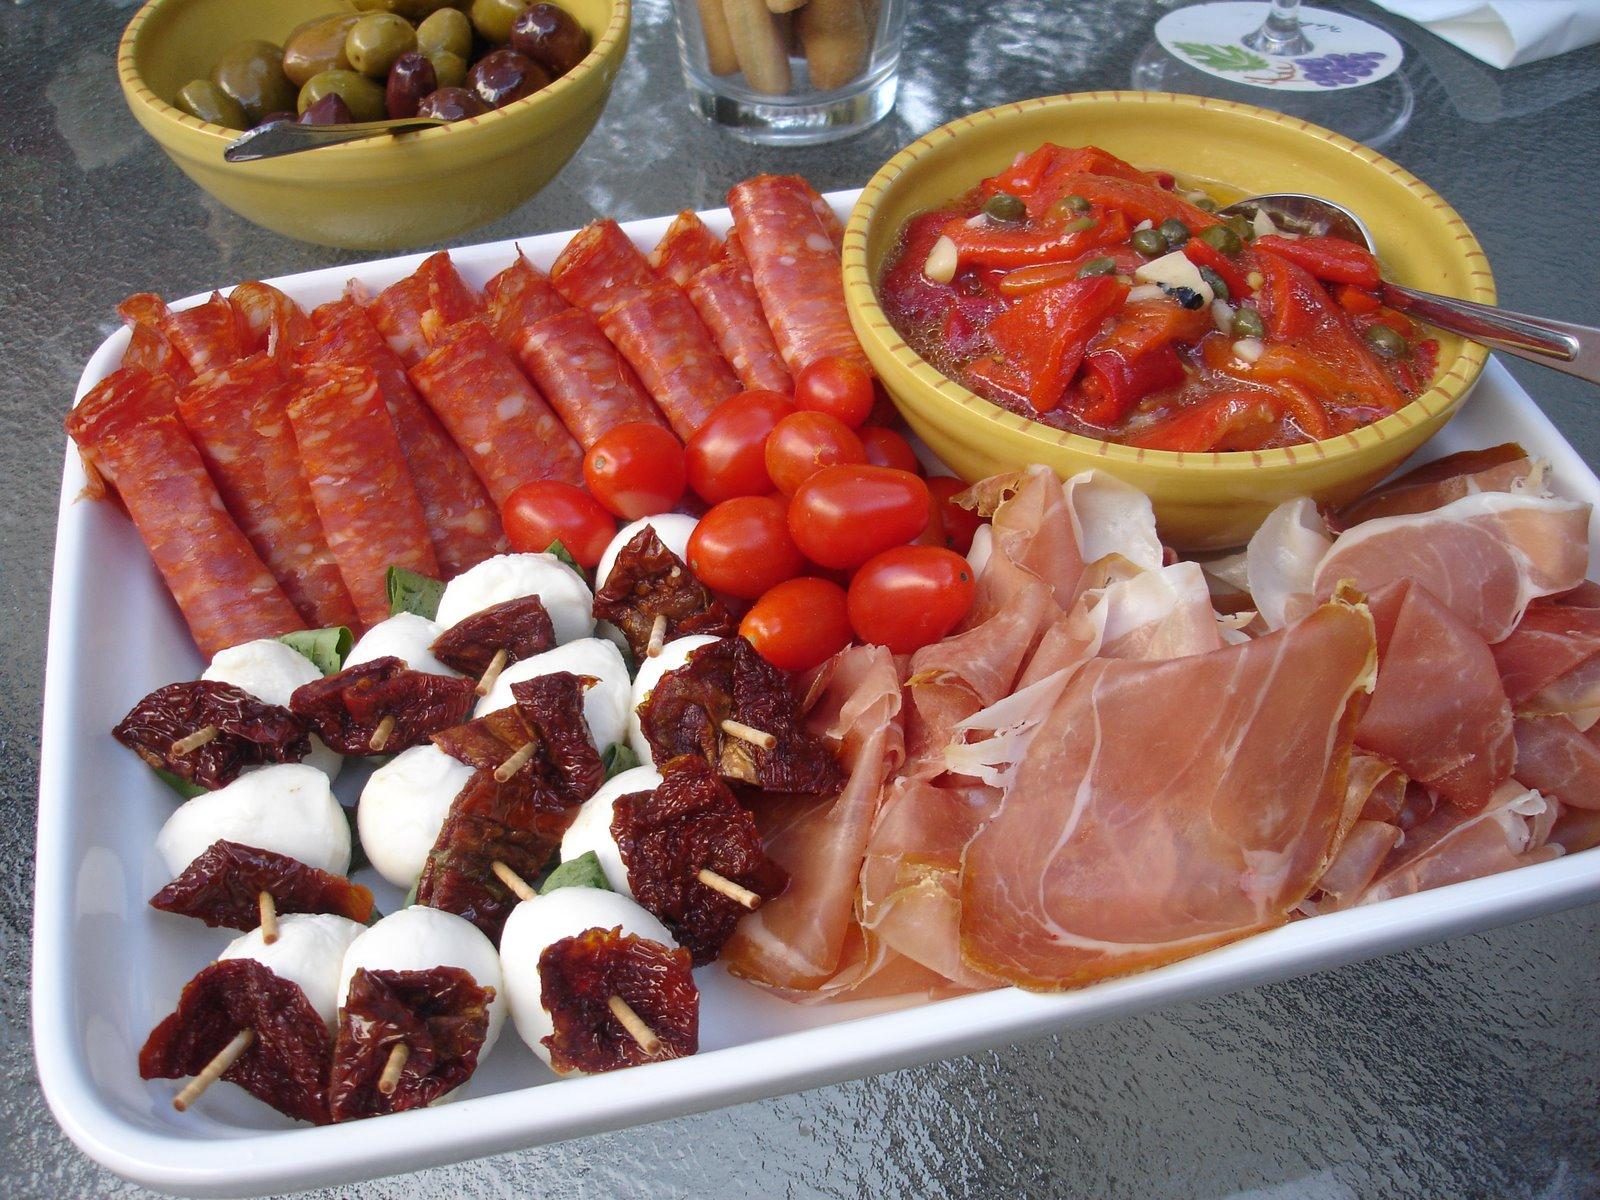 Italian cuisine tuna toast Ina garten appetizer platter